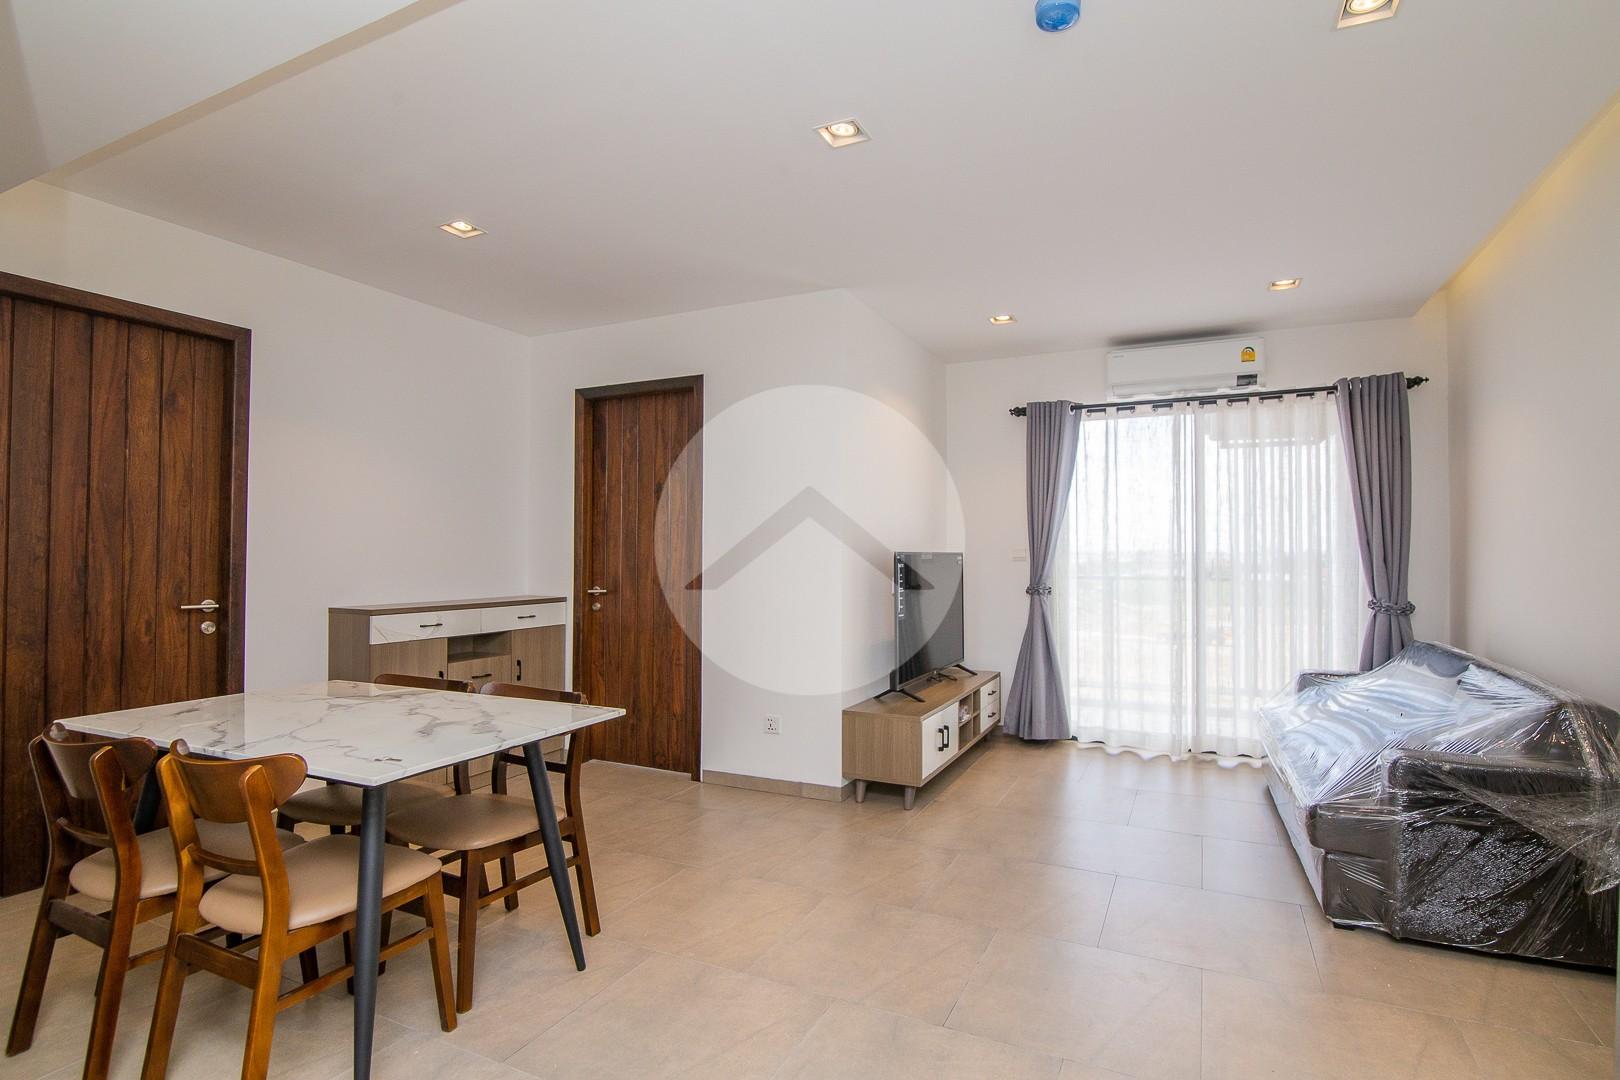 2 Bedroom Apartment For Rent - Urban Village, Phnom Penh